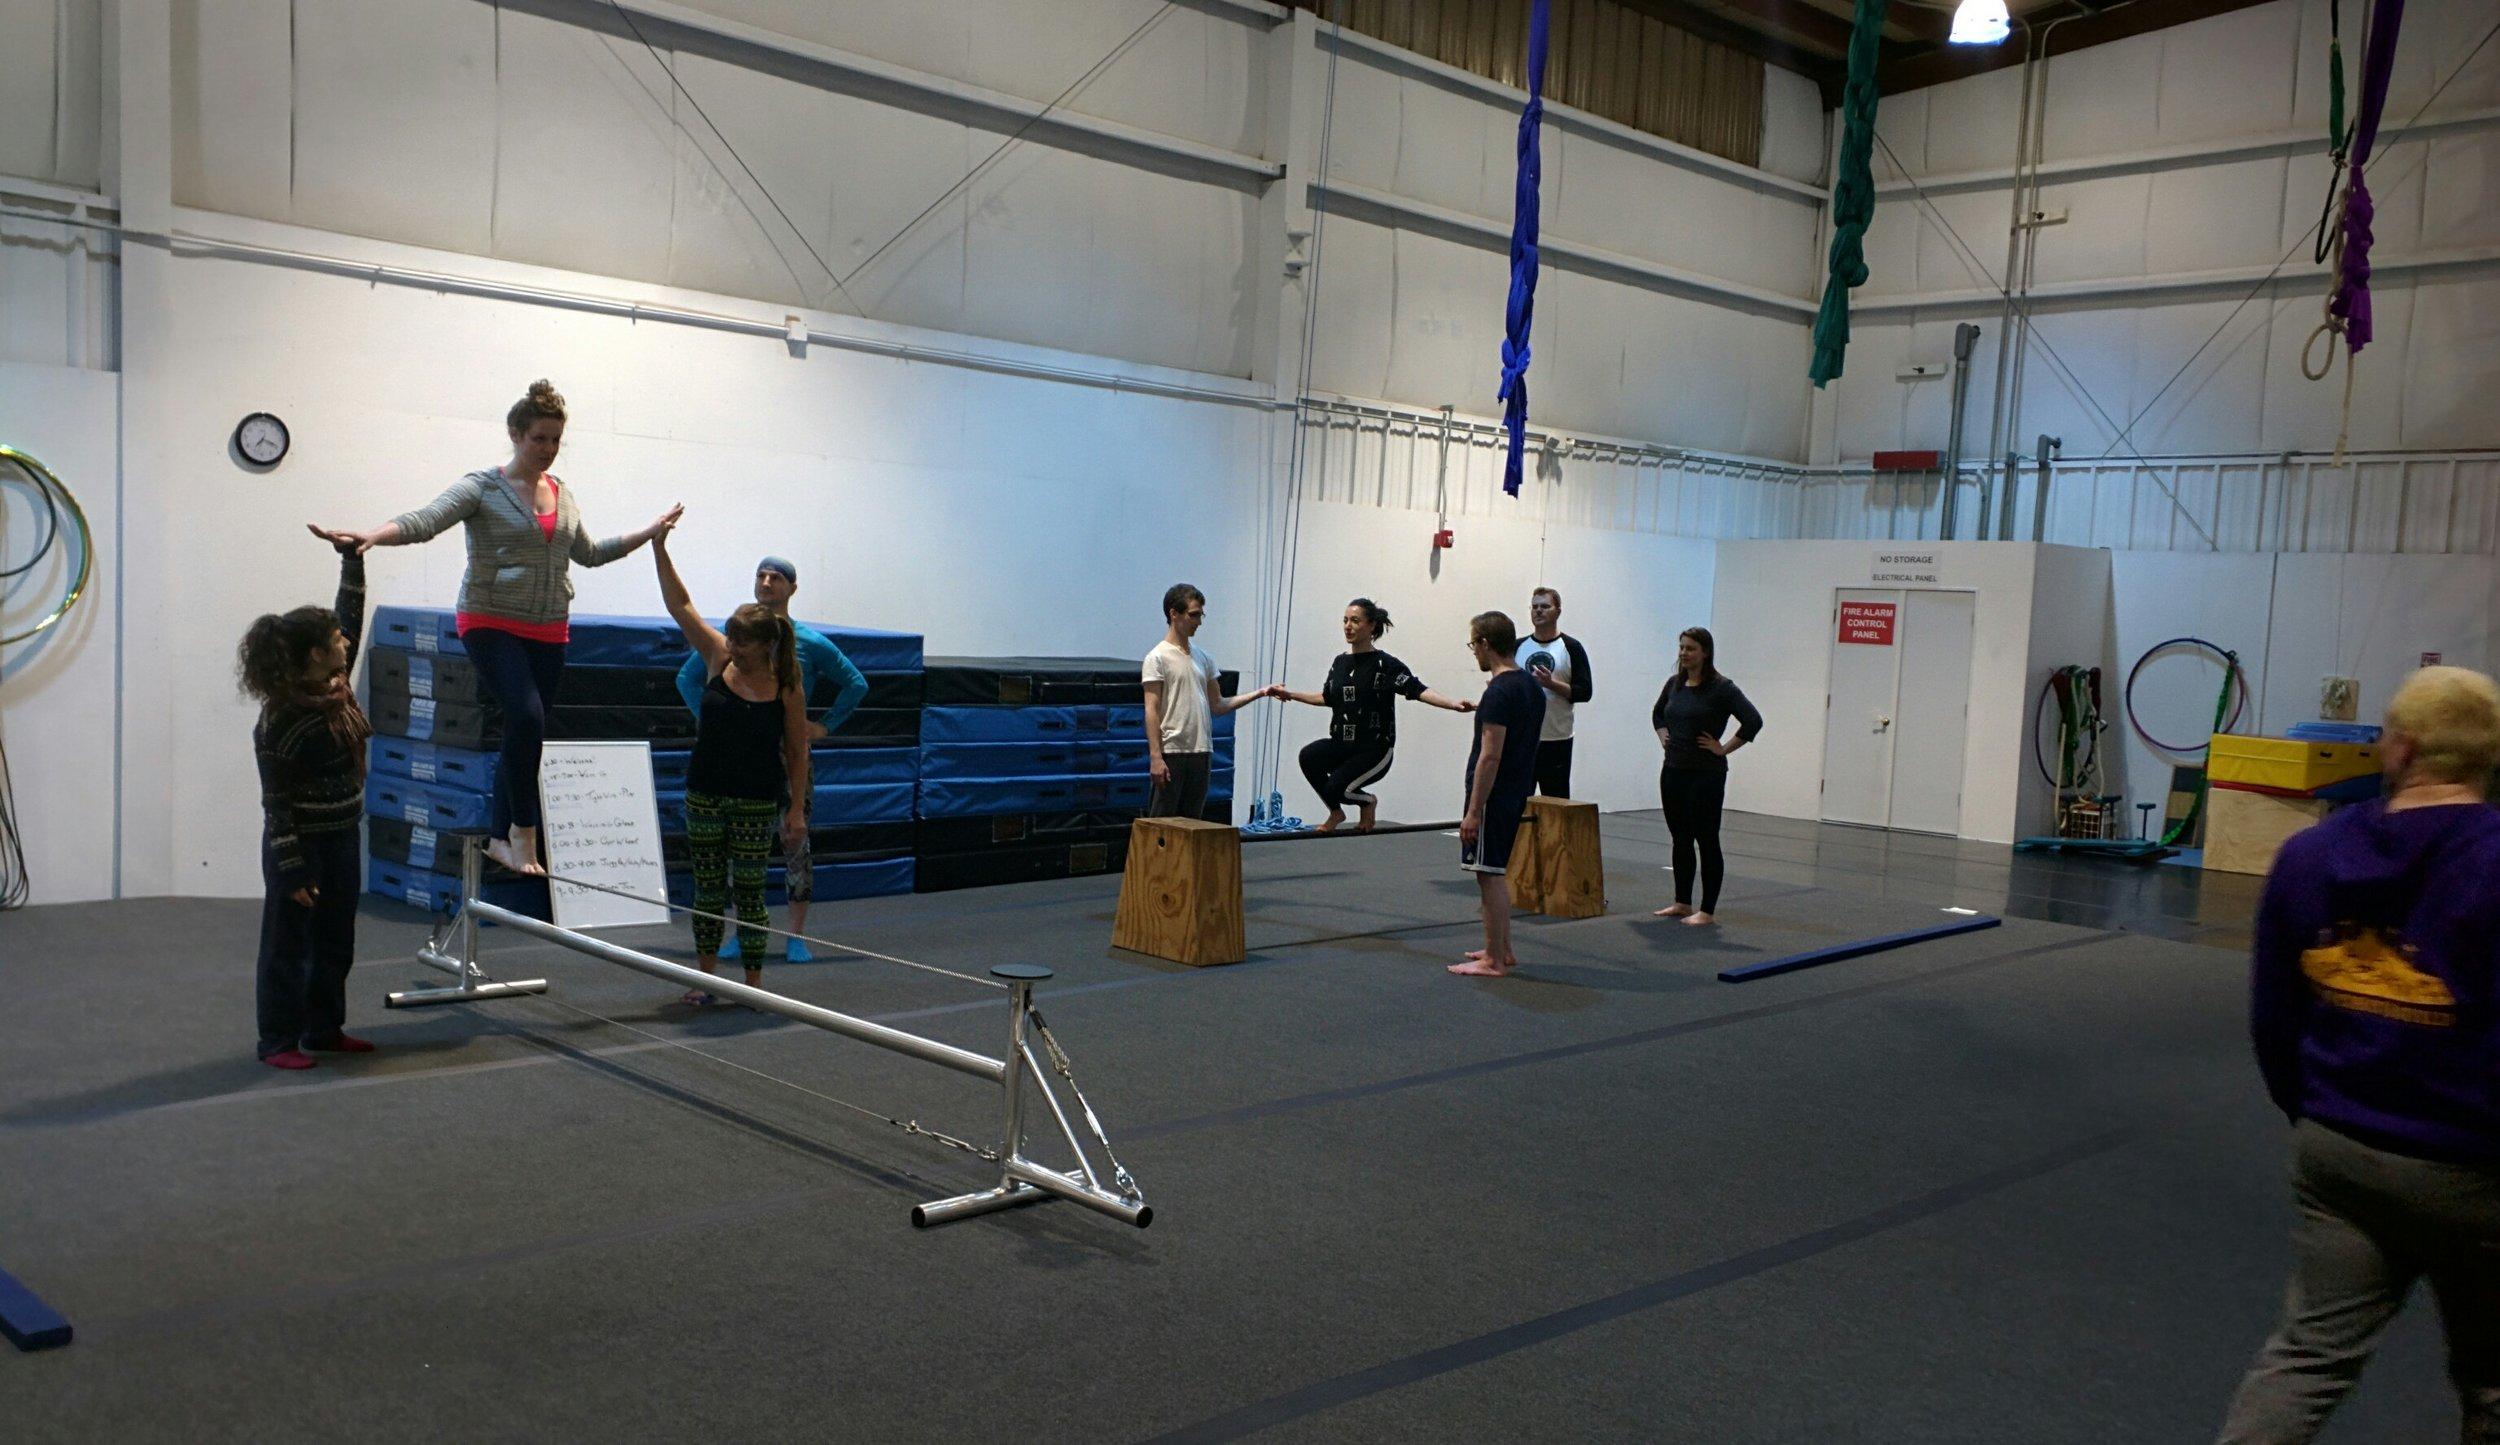 Teen & Adult Wire Walking & Balance Skills